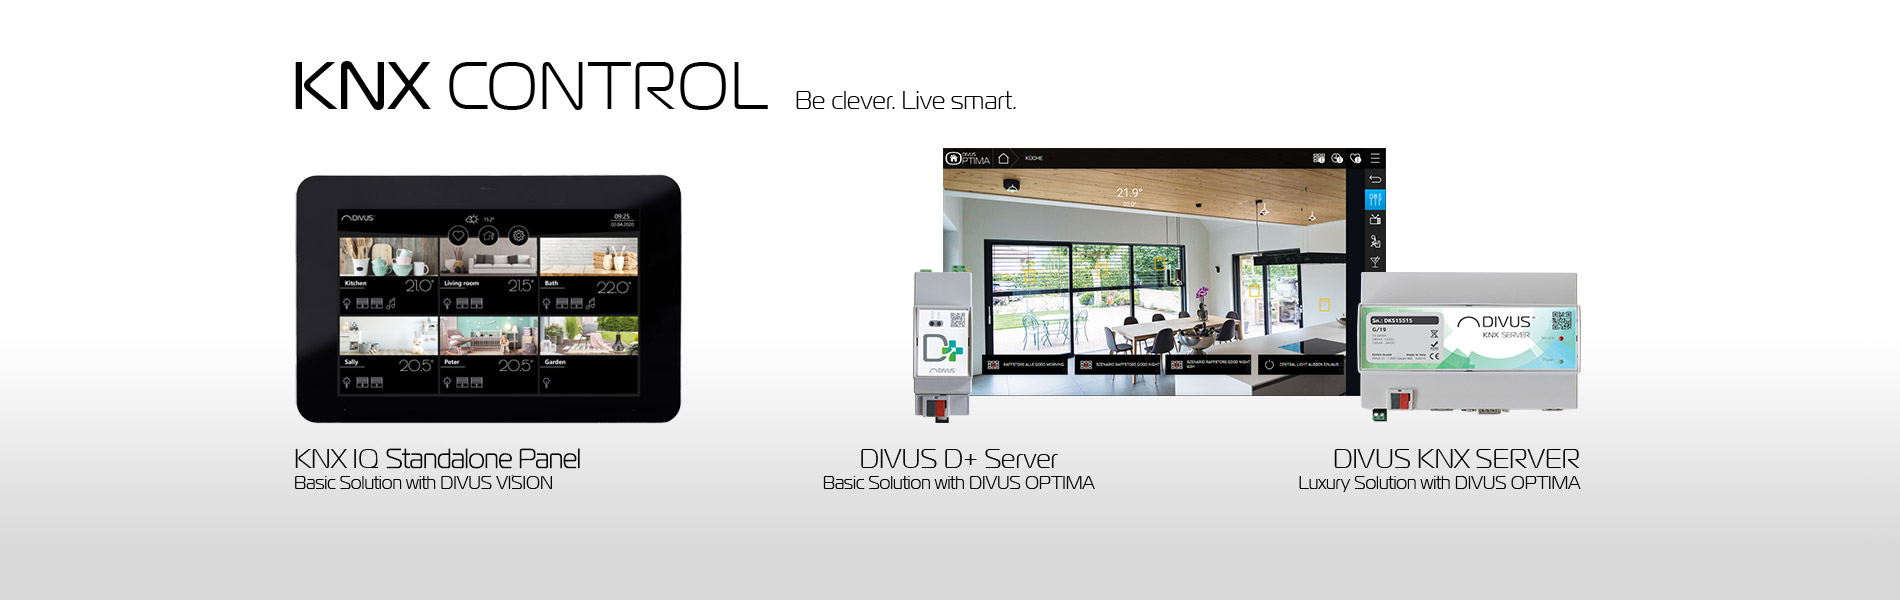 DIVUS_KNX_CONTROL_en